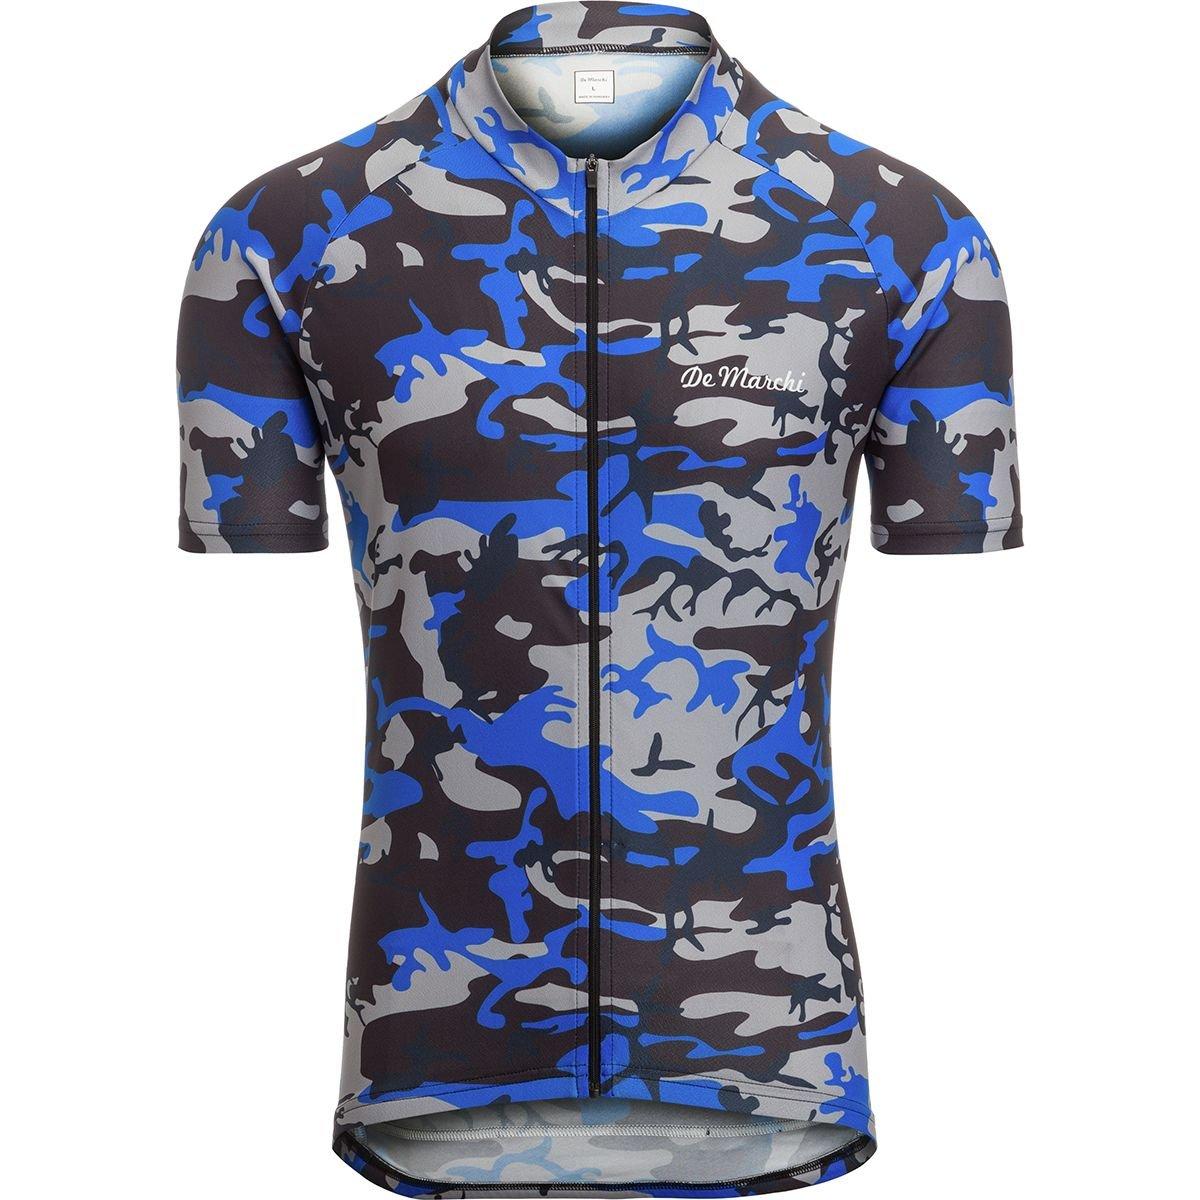 De Marchi Camo半袖Jersey – Men 's X-Large ブルーカモ(Blue Camo) B07CSXR4WX